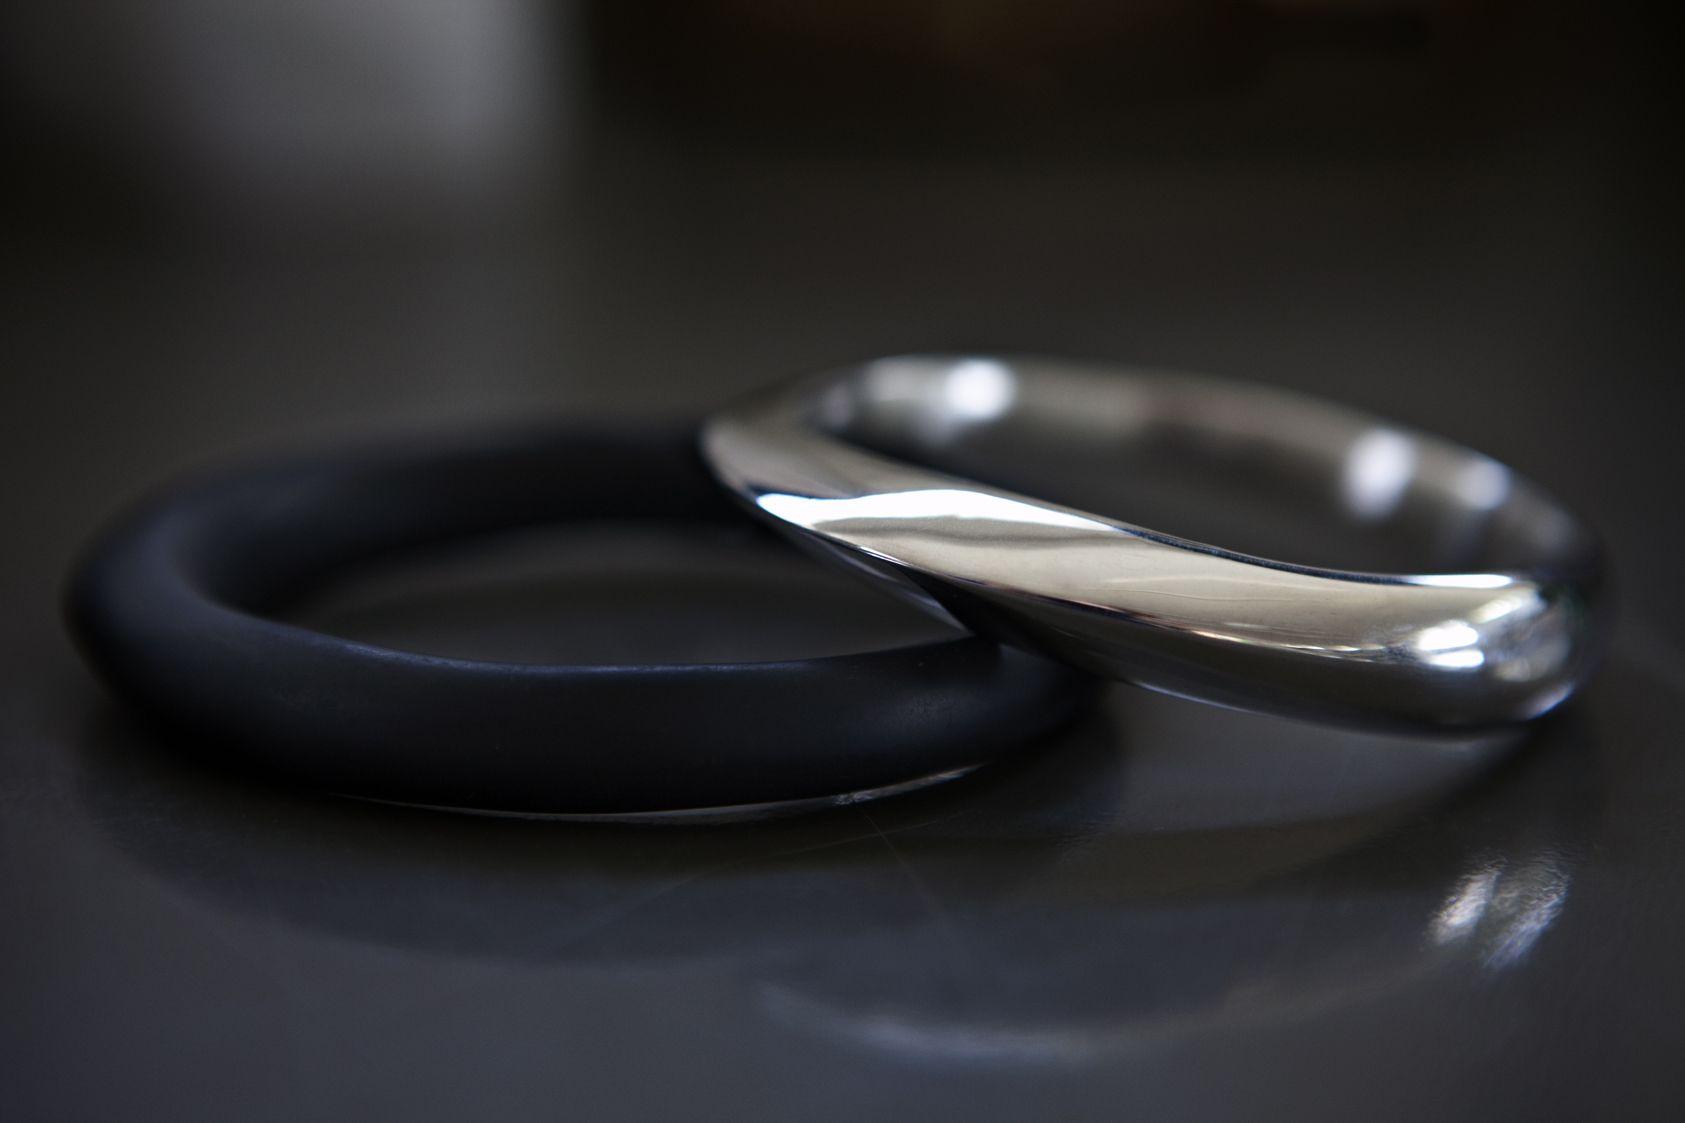 Dinosaur Designs The Art of Black & White 2013 Resin and Silver Bangles